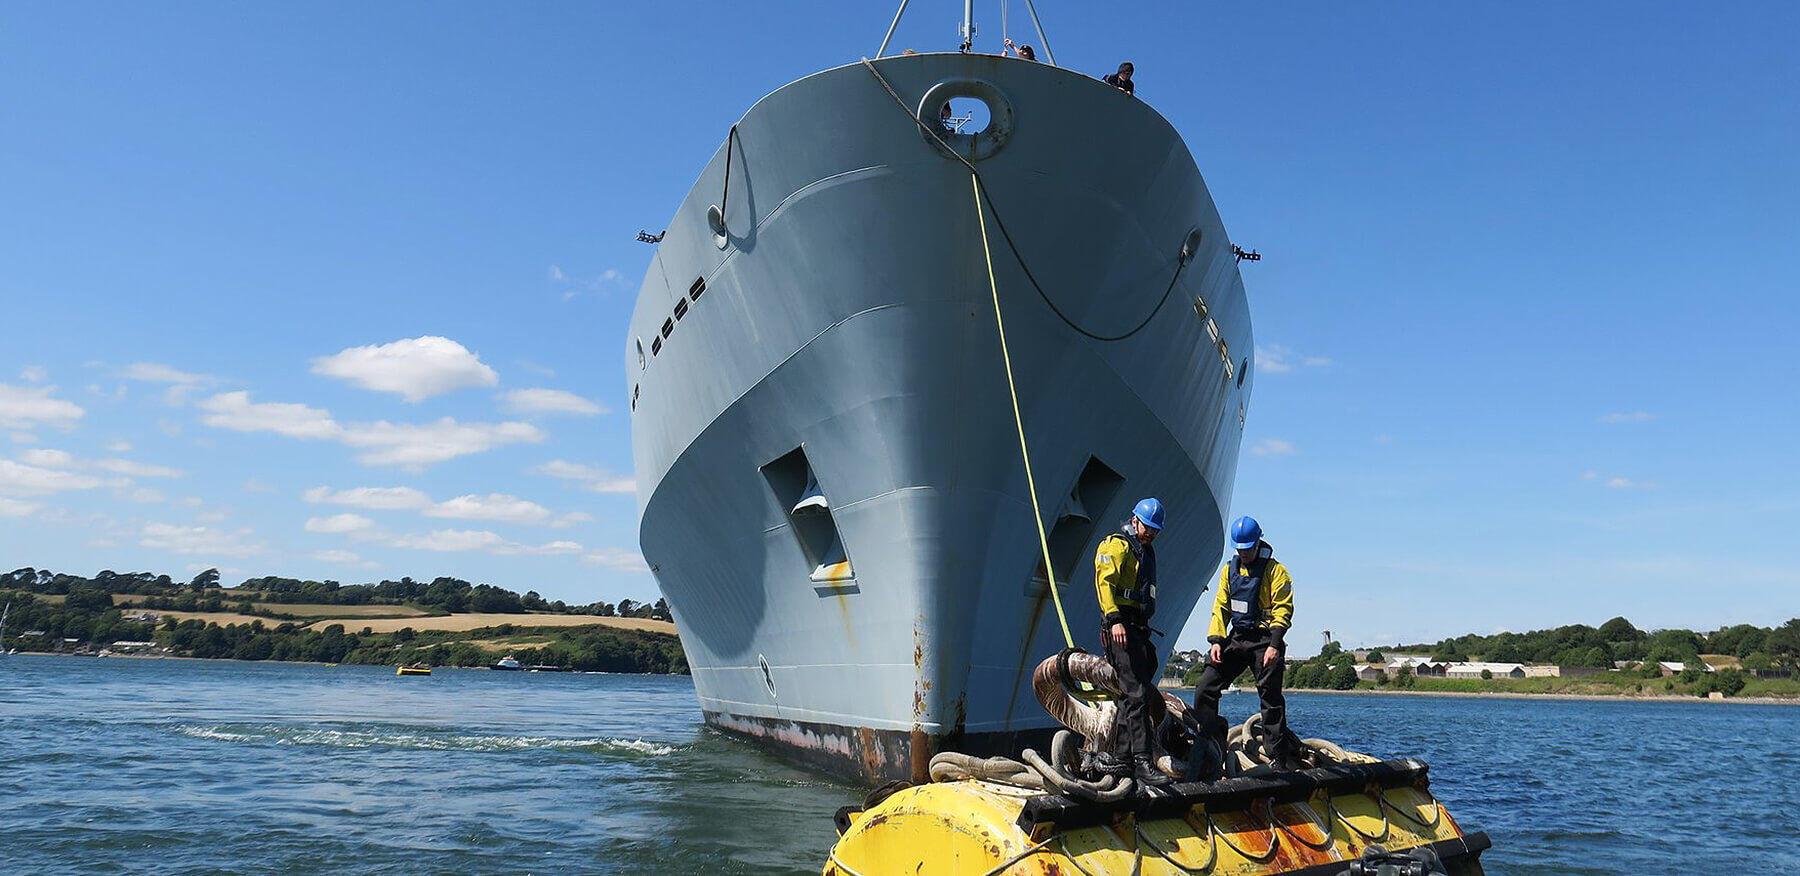 HMS Enterprise deammunitioning at bouy in Tamar